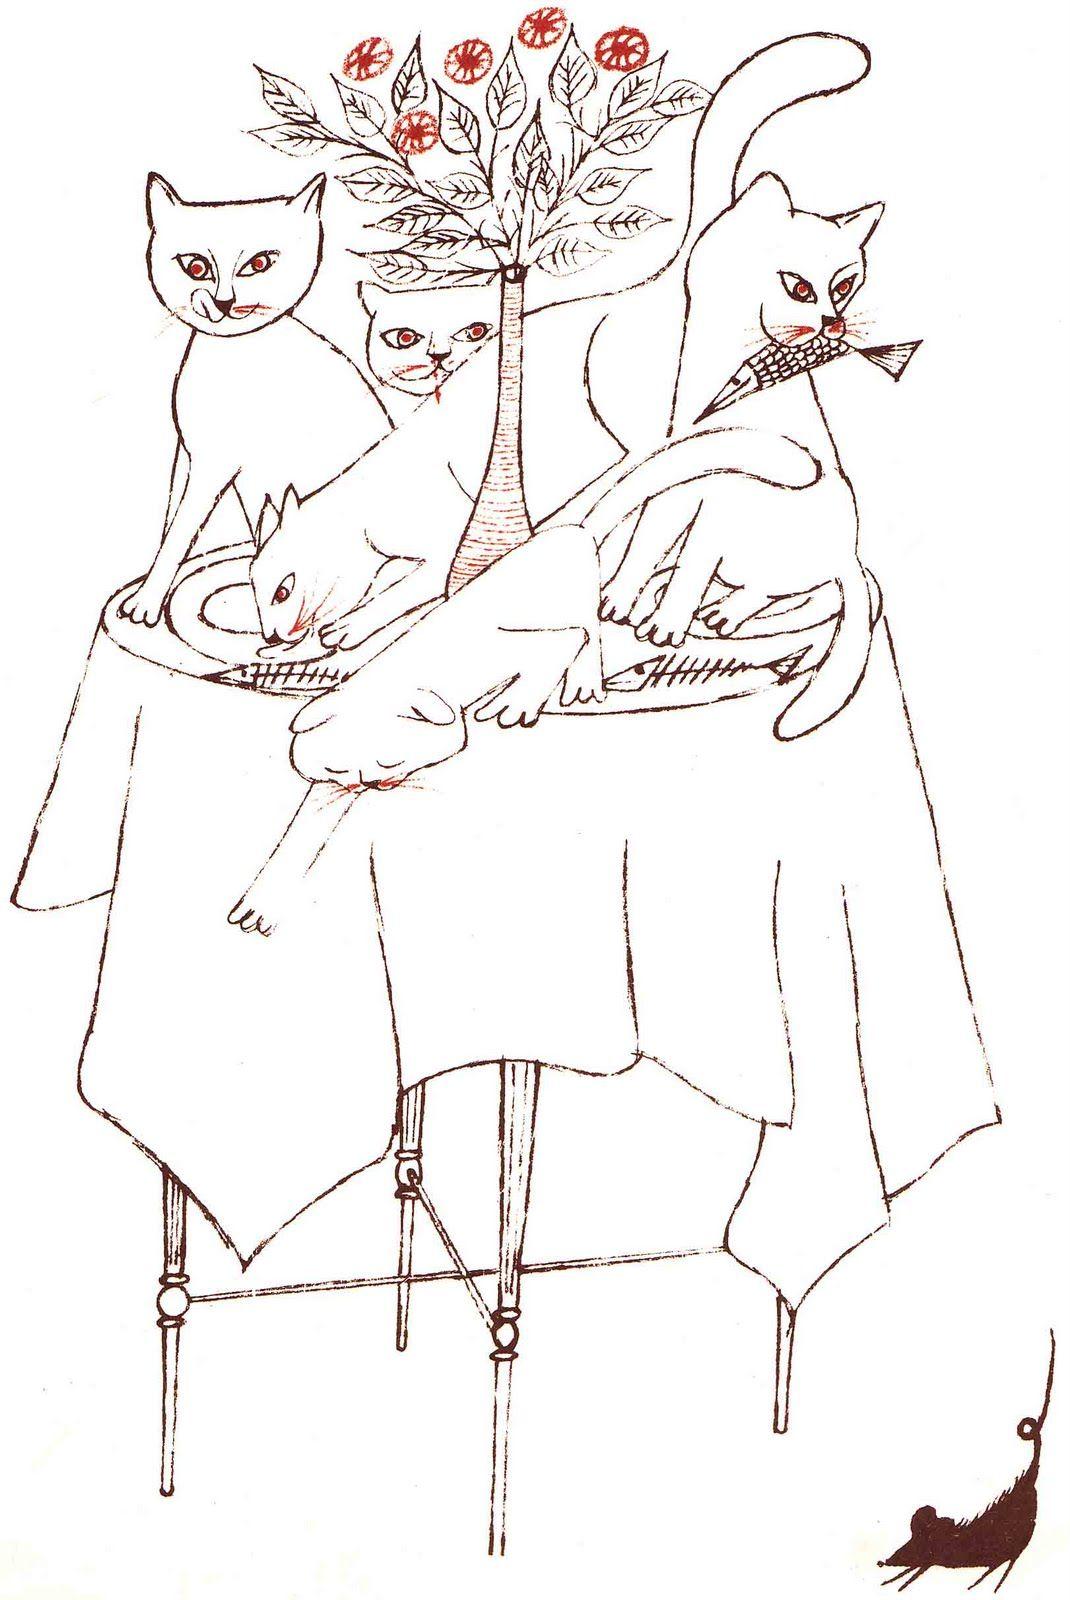 cats cats cats cats cats, beatrice schenk de regniers (illustrated